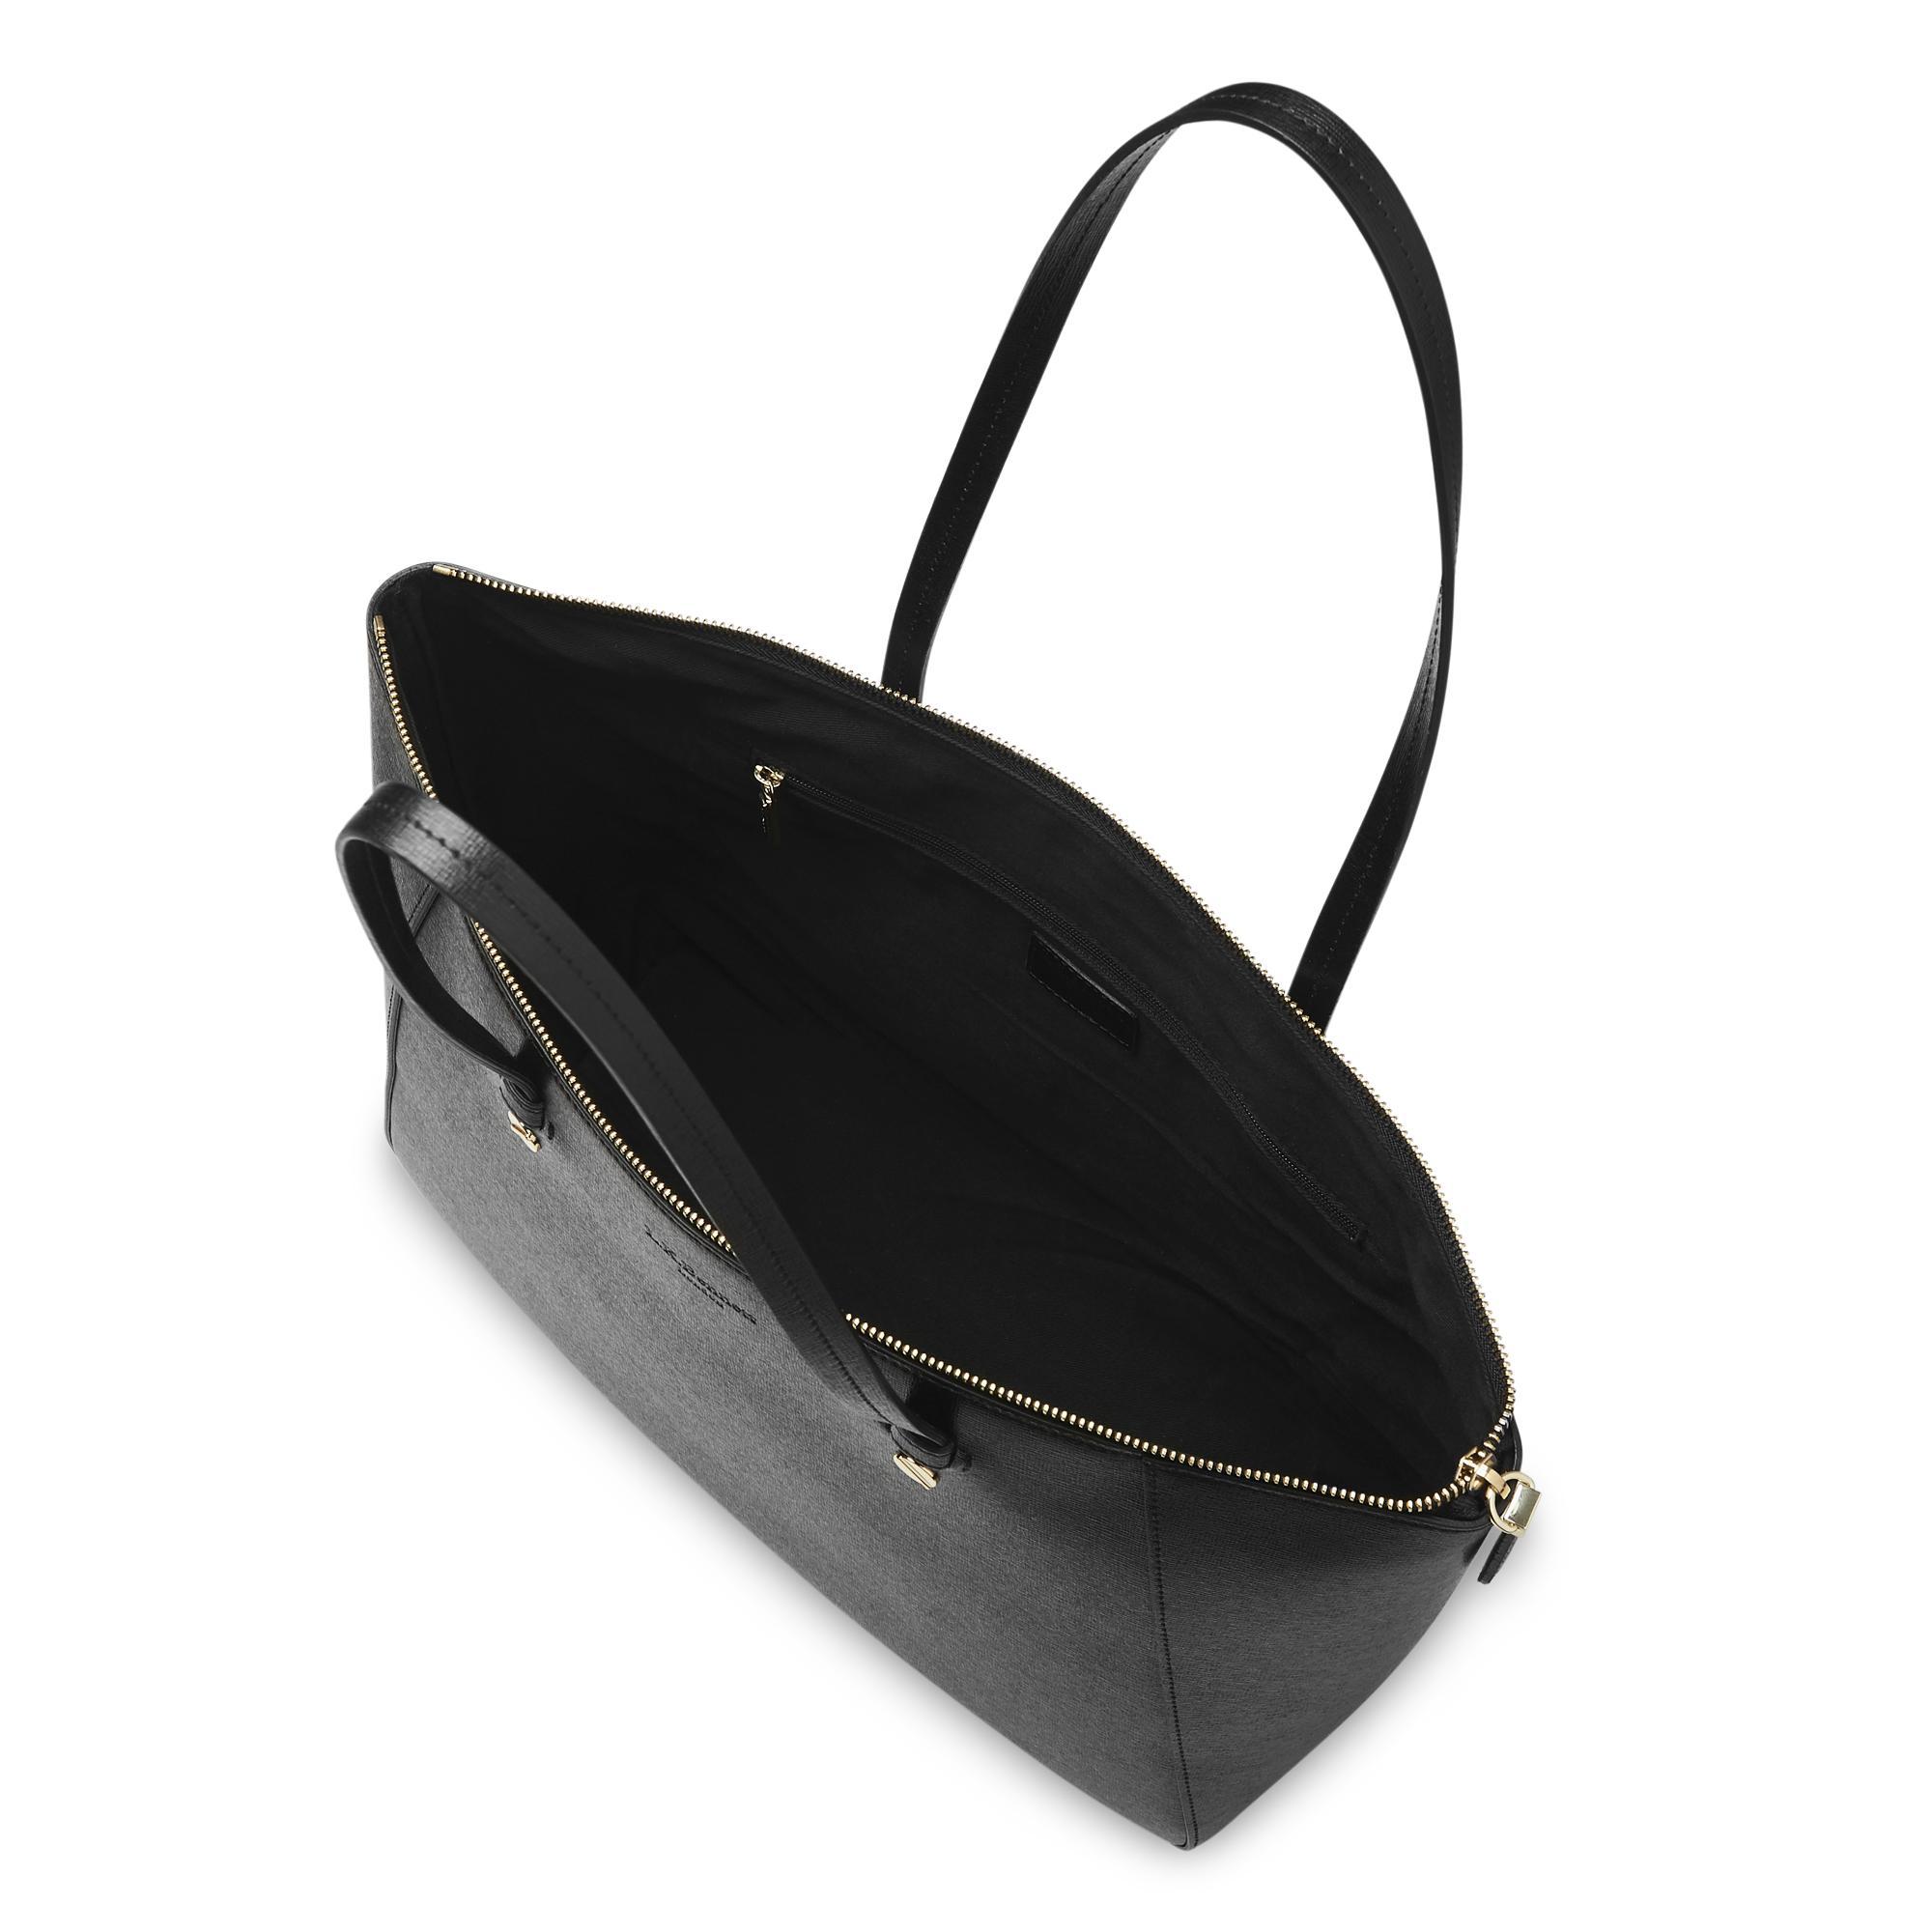 654ff94d Marcia Black Leather Tote Bag